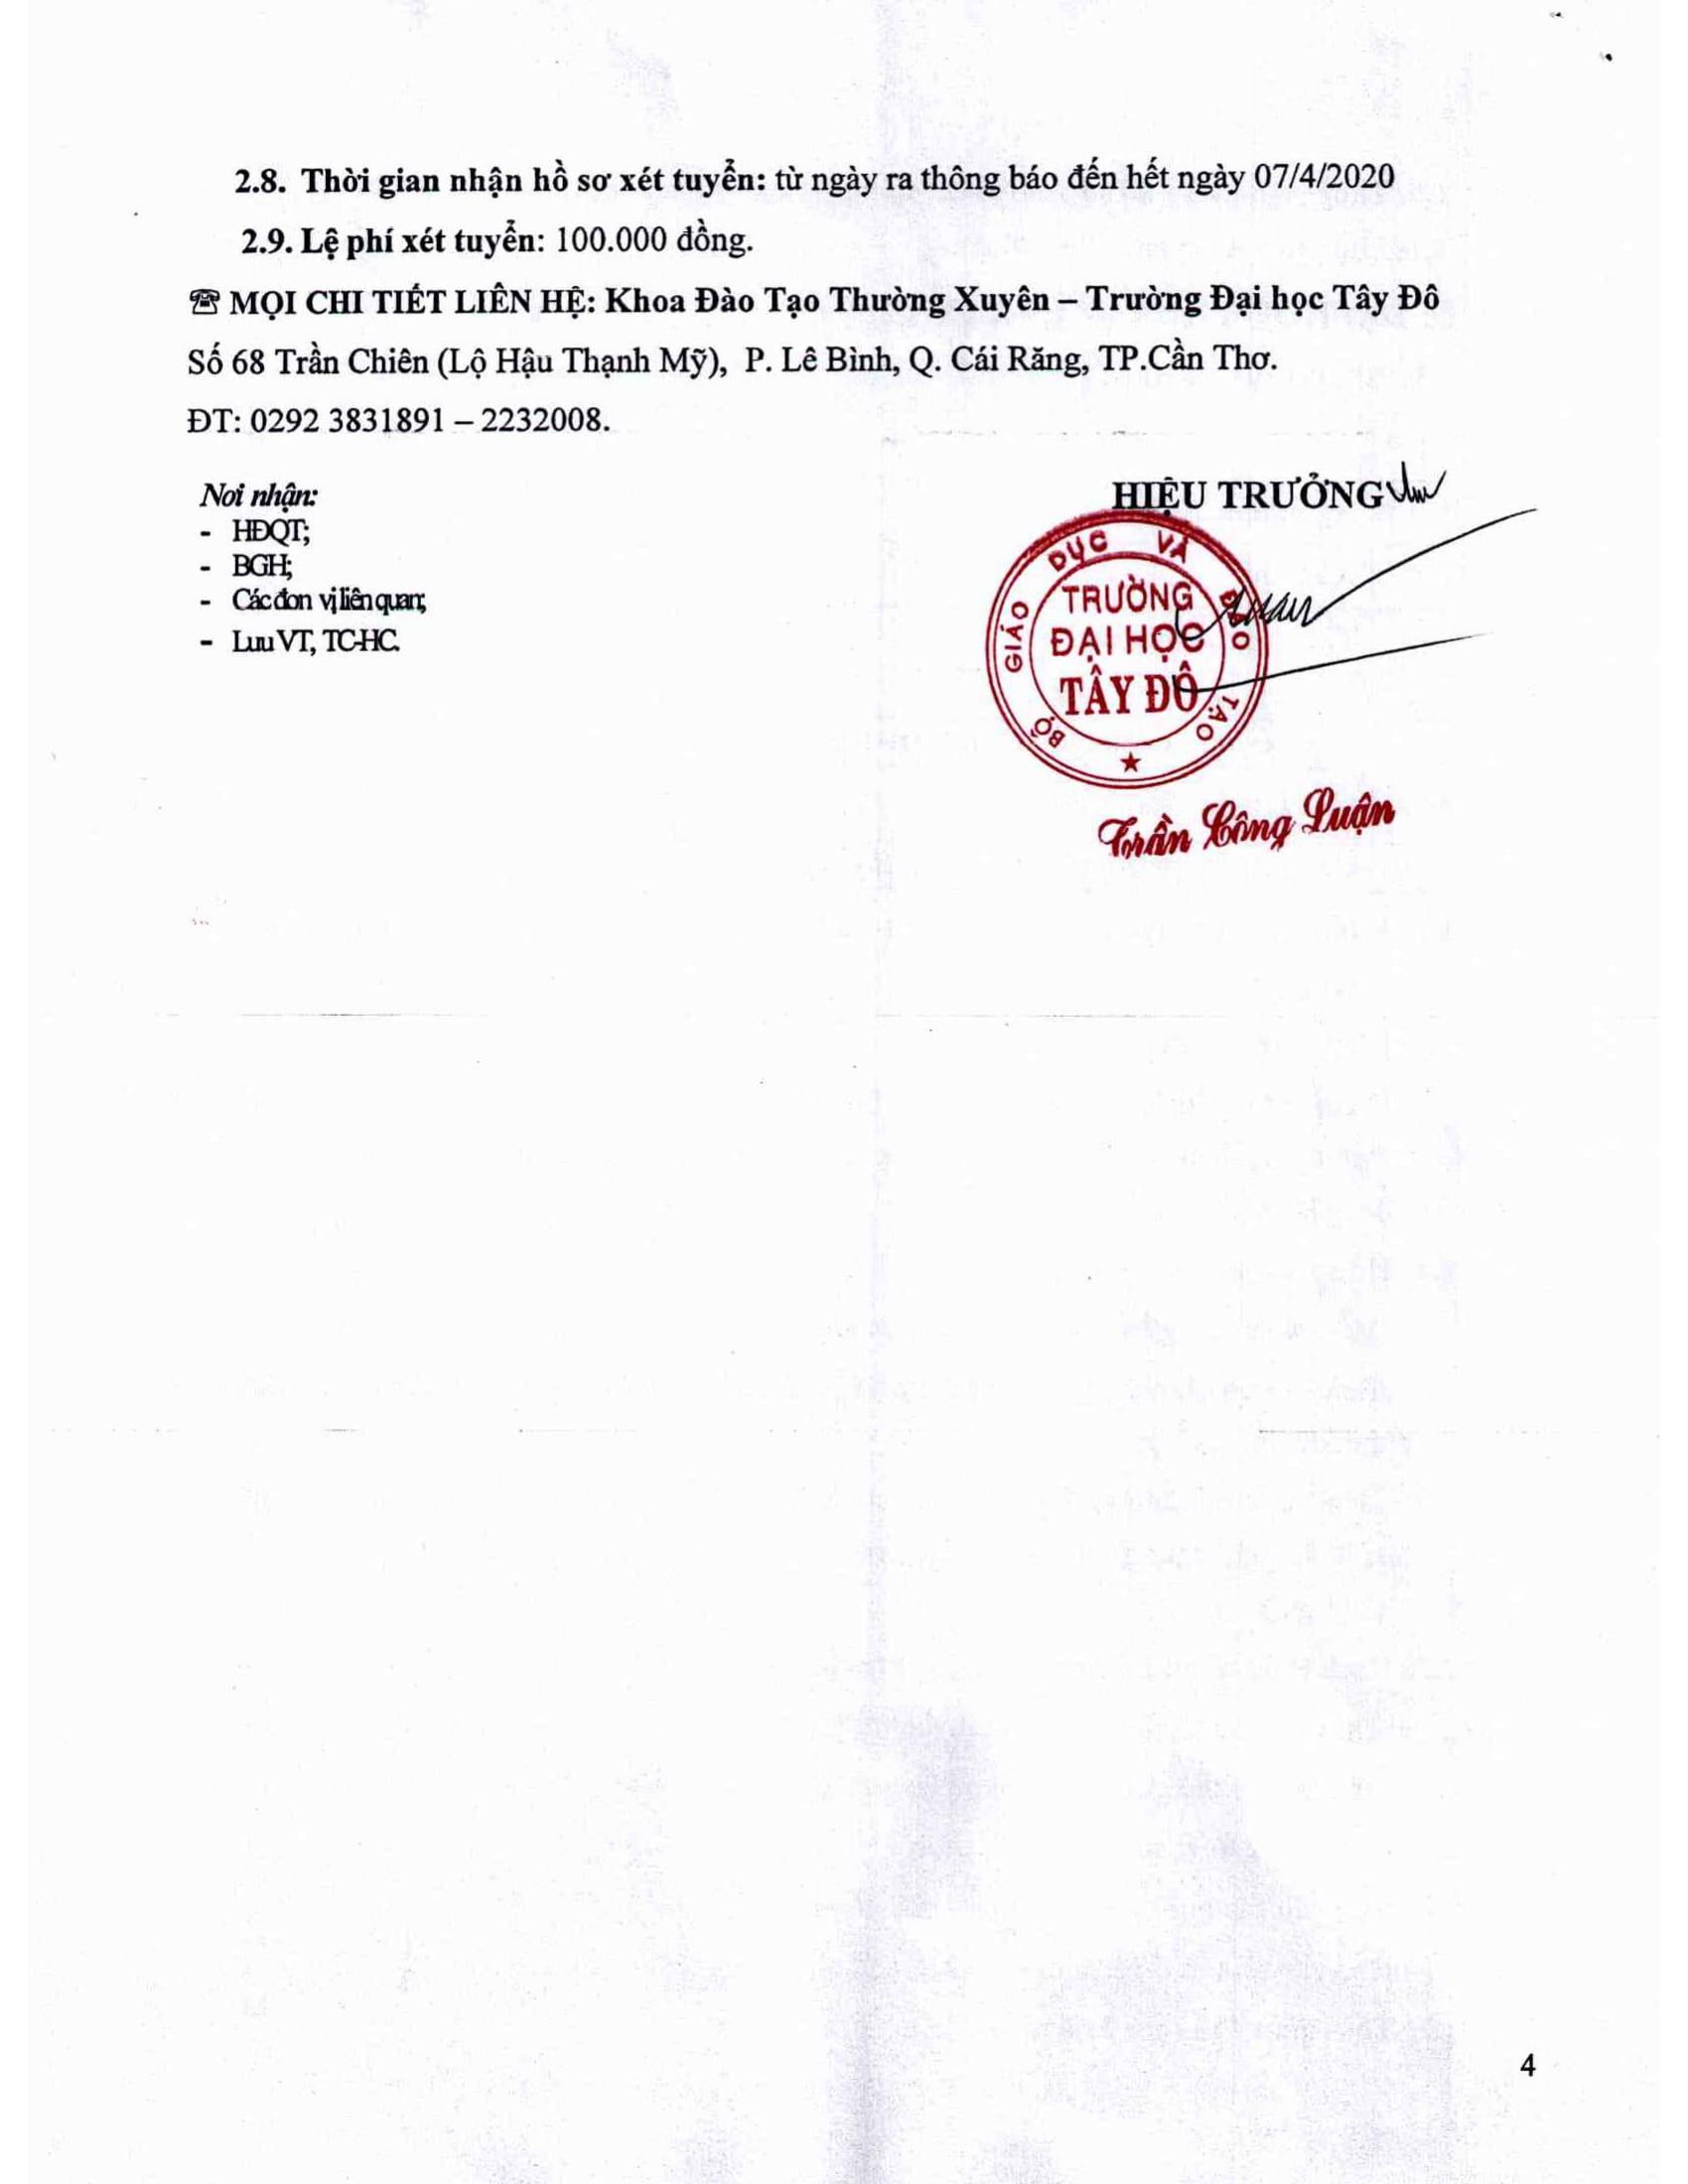 thong-bao-tuyen-sinh-vua-hoc-vua-lam-vb2-dot1-2020-4